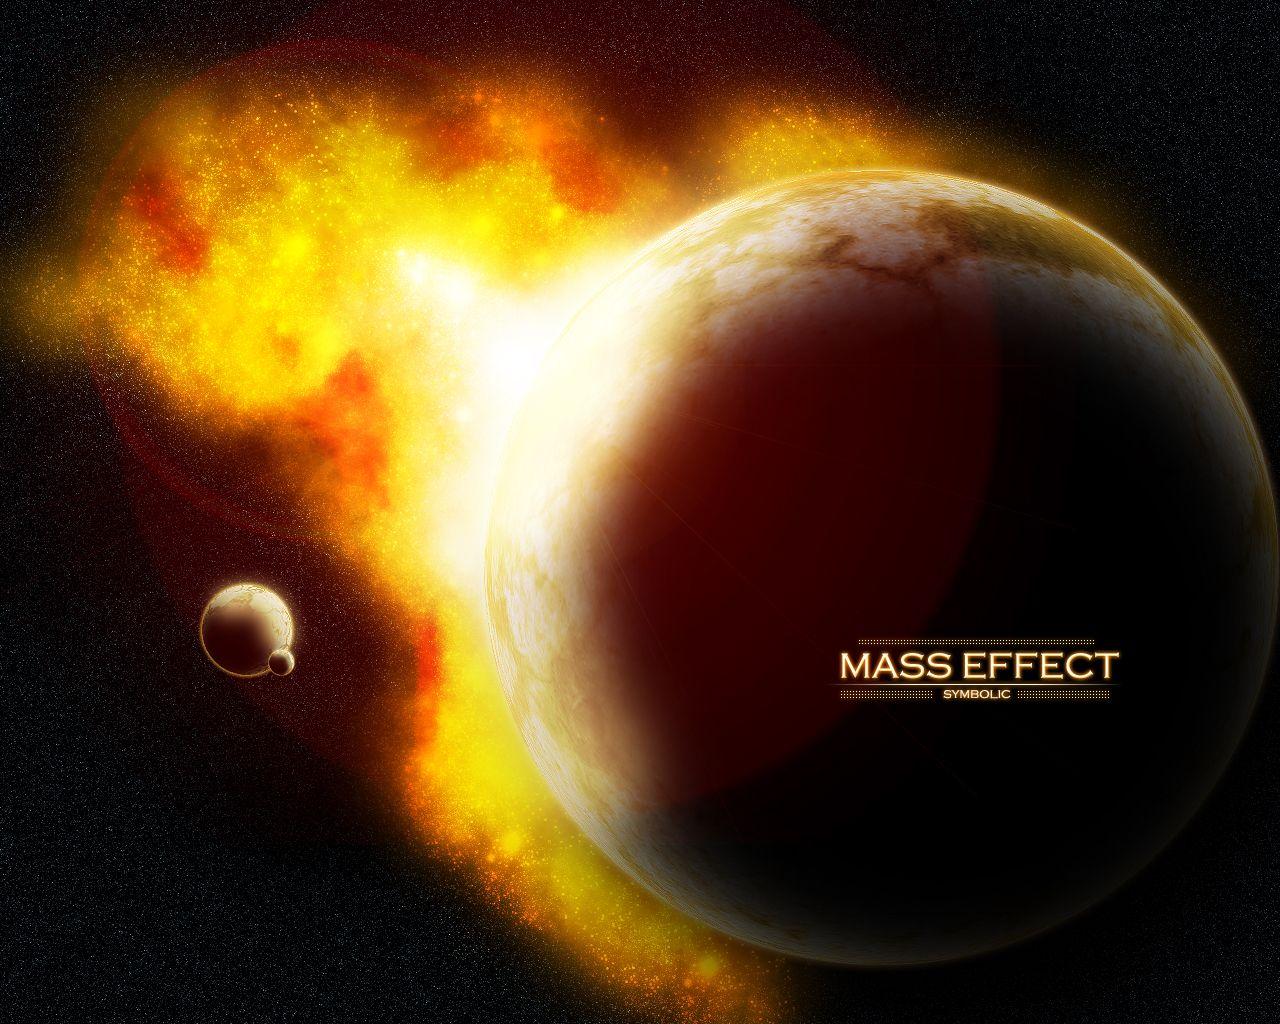 Mass Effect by KuyashigaruSymbolic on deviantART